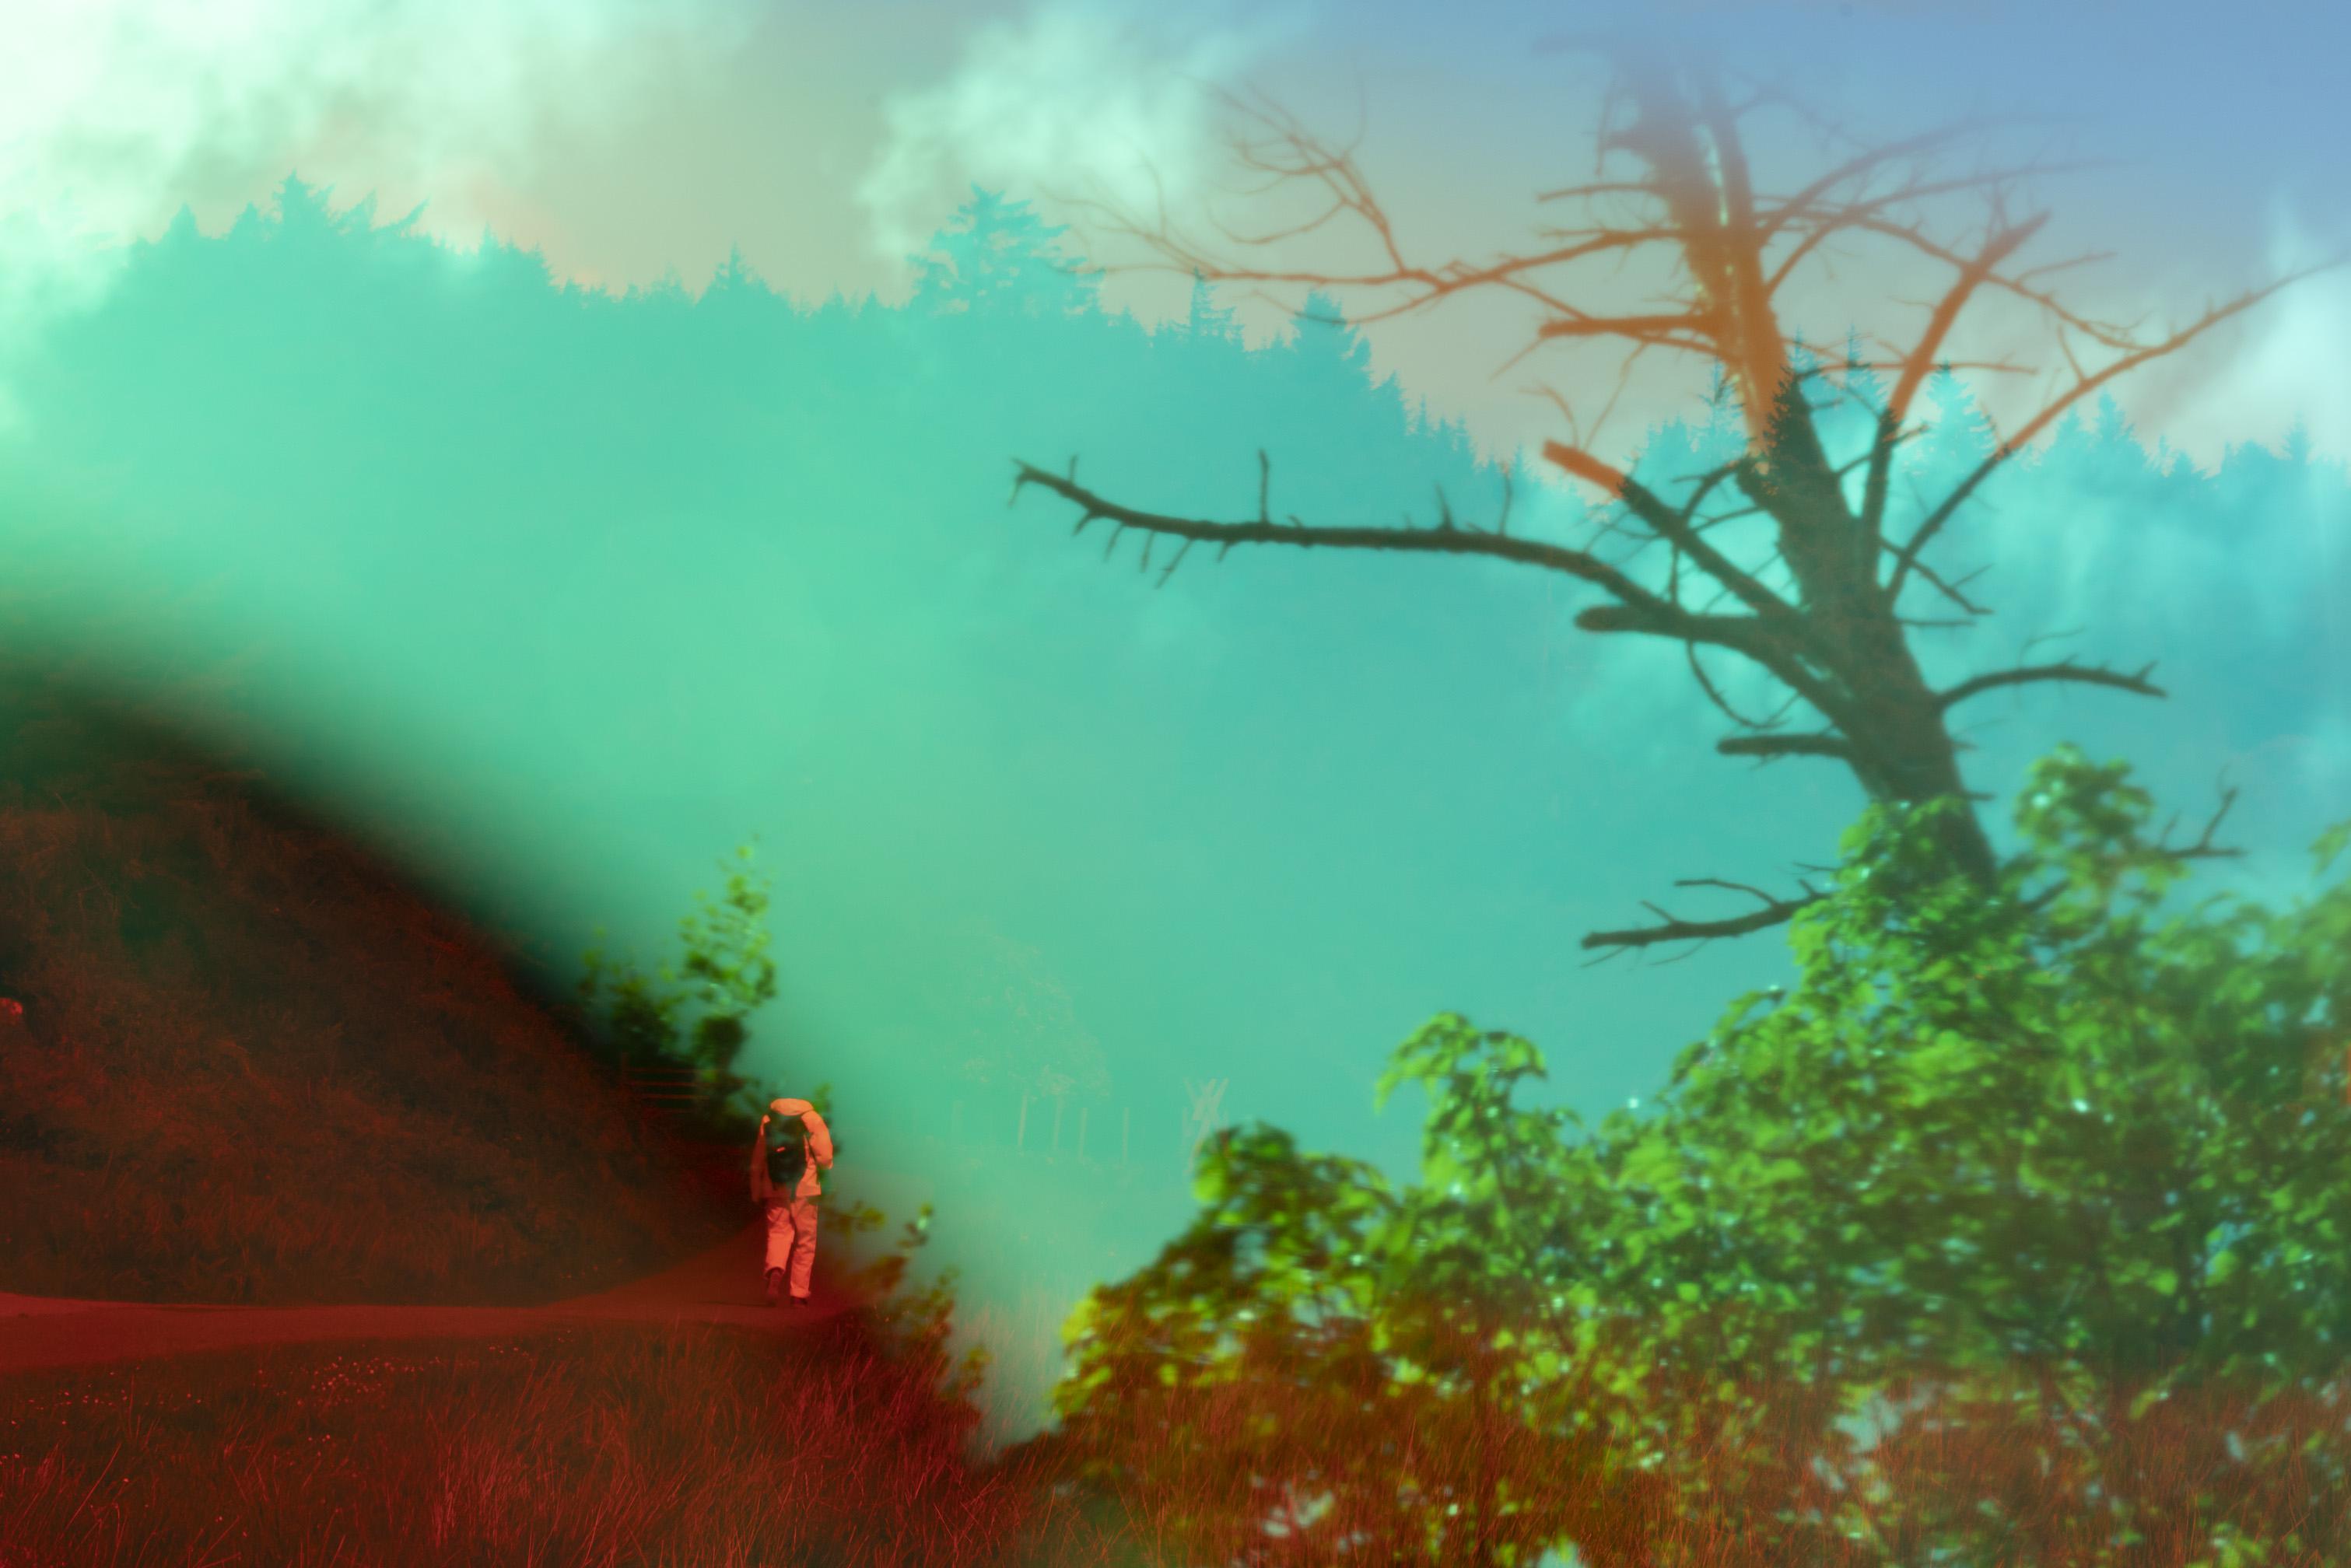 Arthur King - Changing Landscapes (Isle of Eigg) - Digital